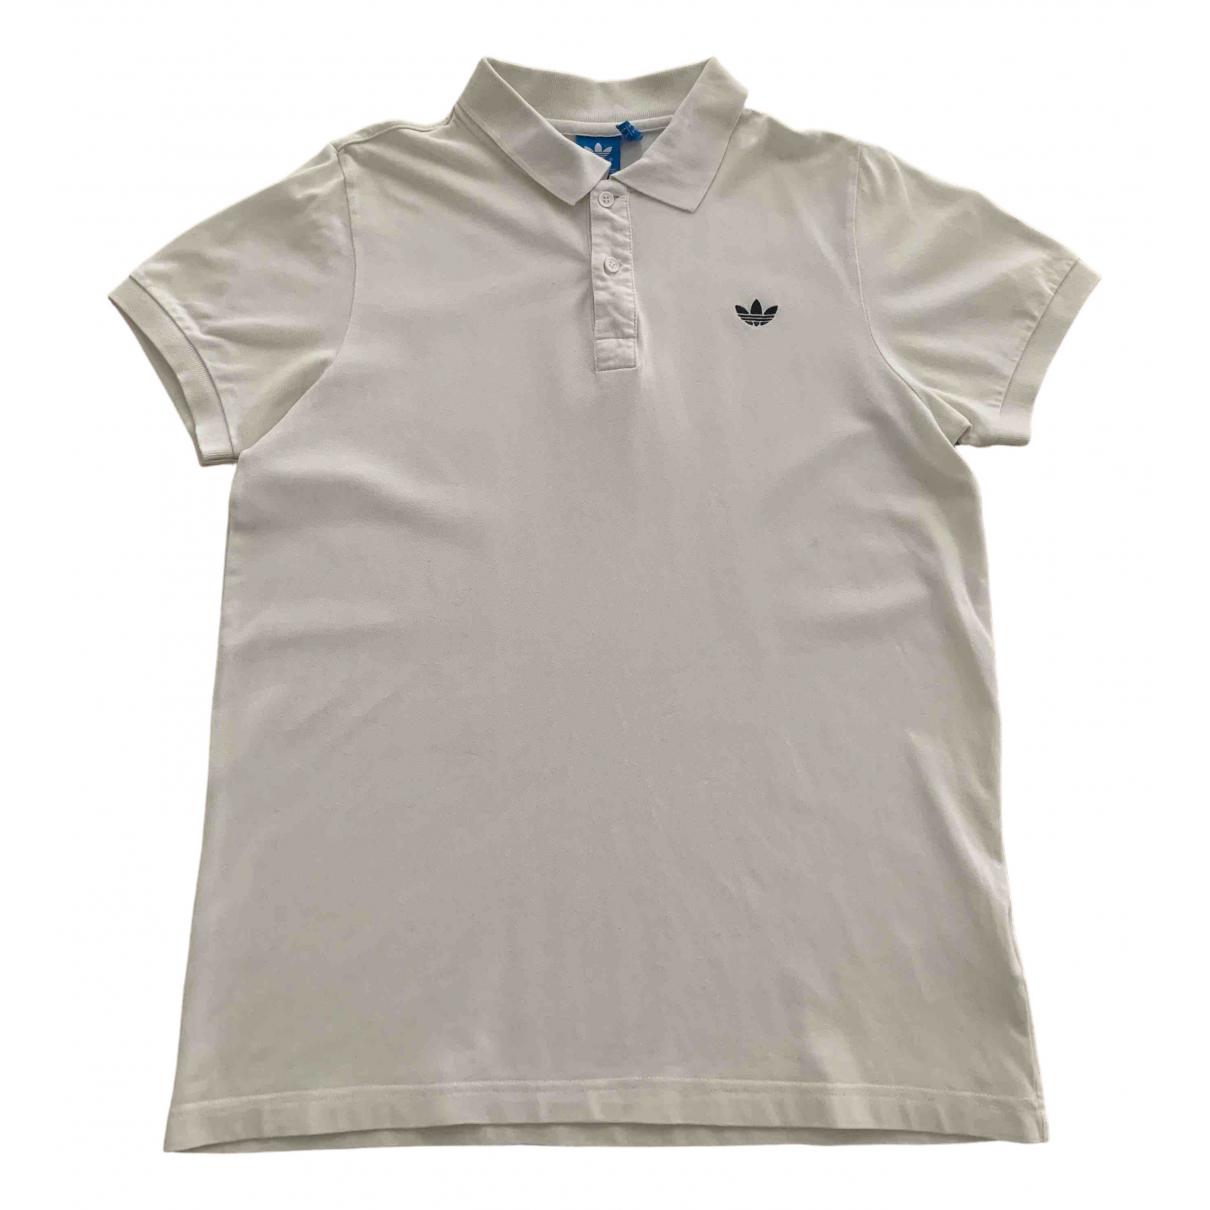 Adidas \N White Cotton Polo shirts for Men M International